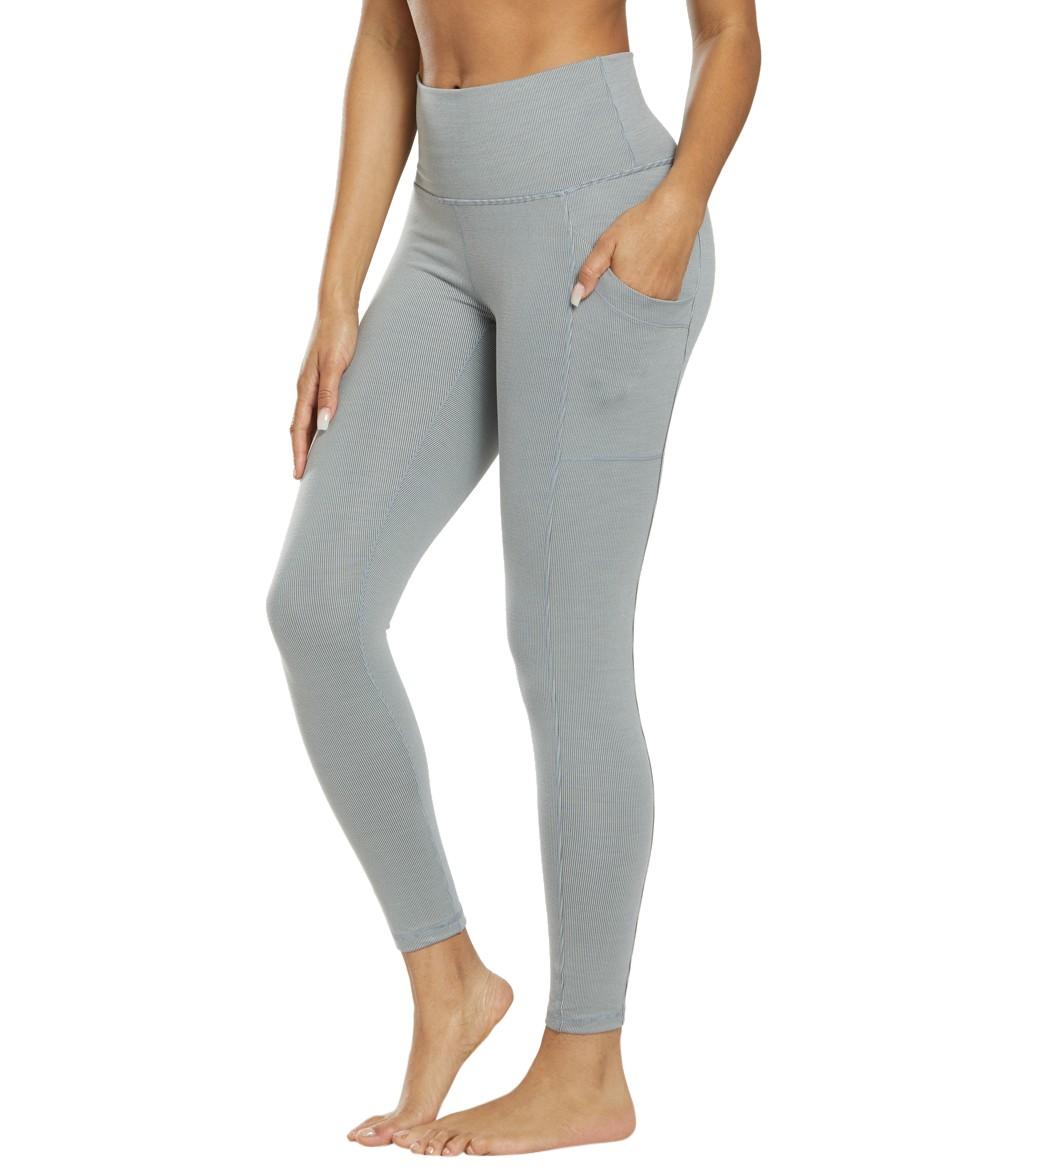 d68c64886ac45 Prana Becksa 7/8 Yoga Leggings at YogaOutlet.com - Free Shipping